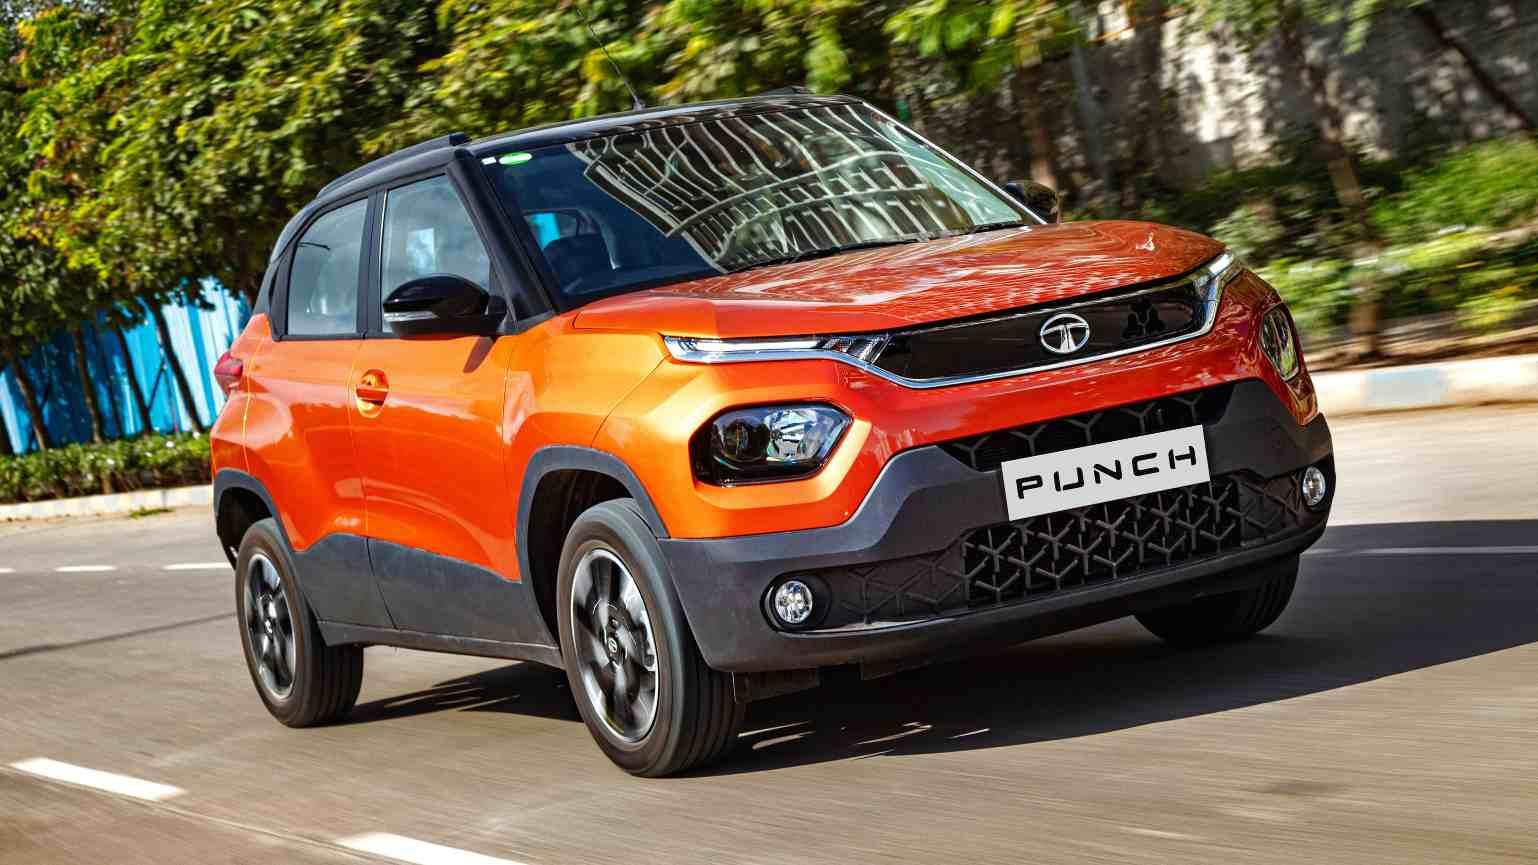 The Tata Punch will slot in below the Nexon in the carmaker's SUV range. Image: Tata Motors